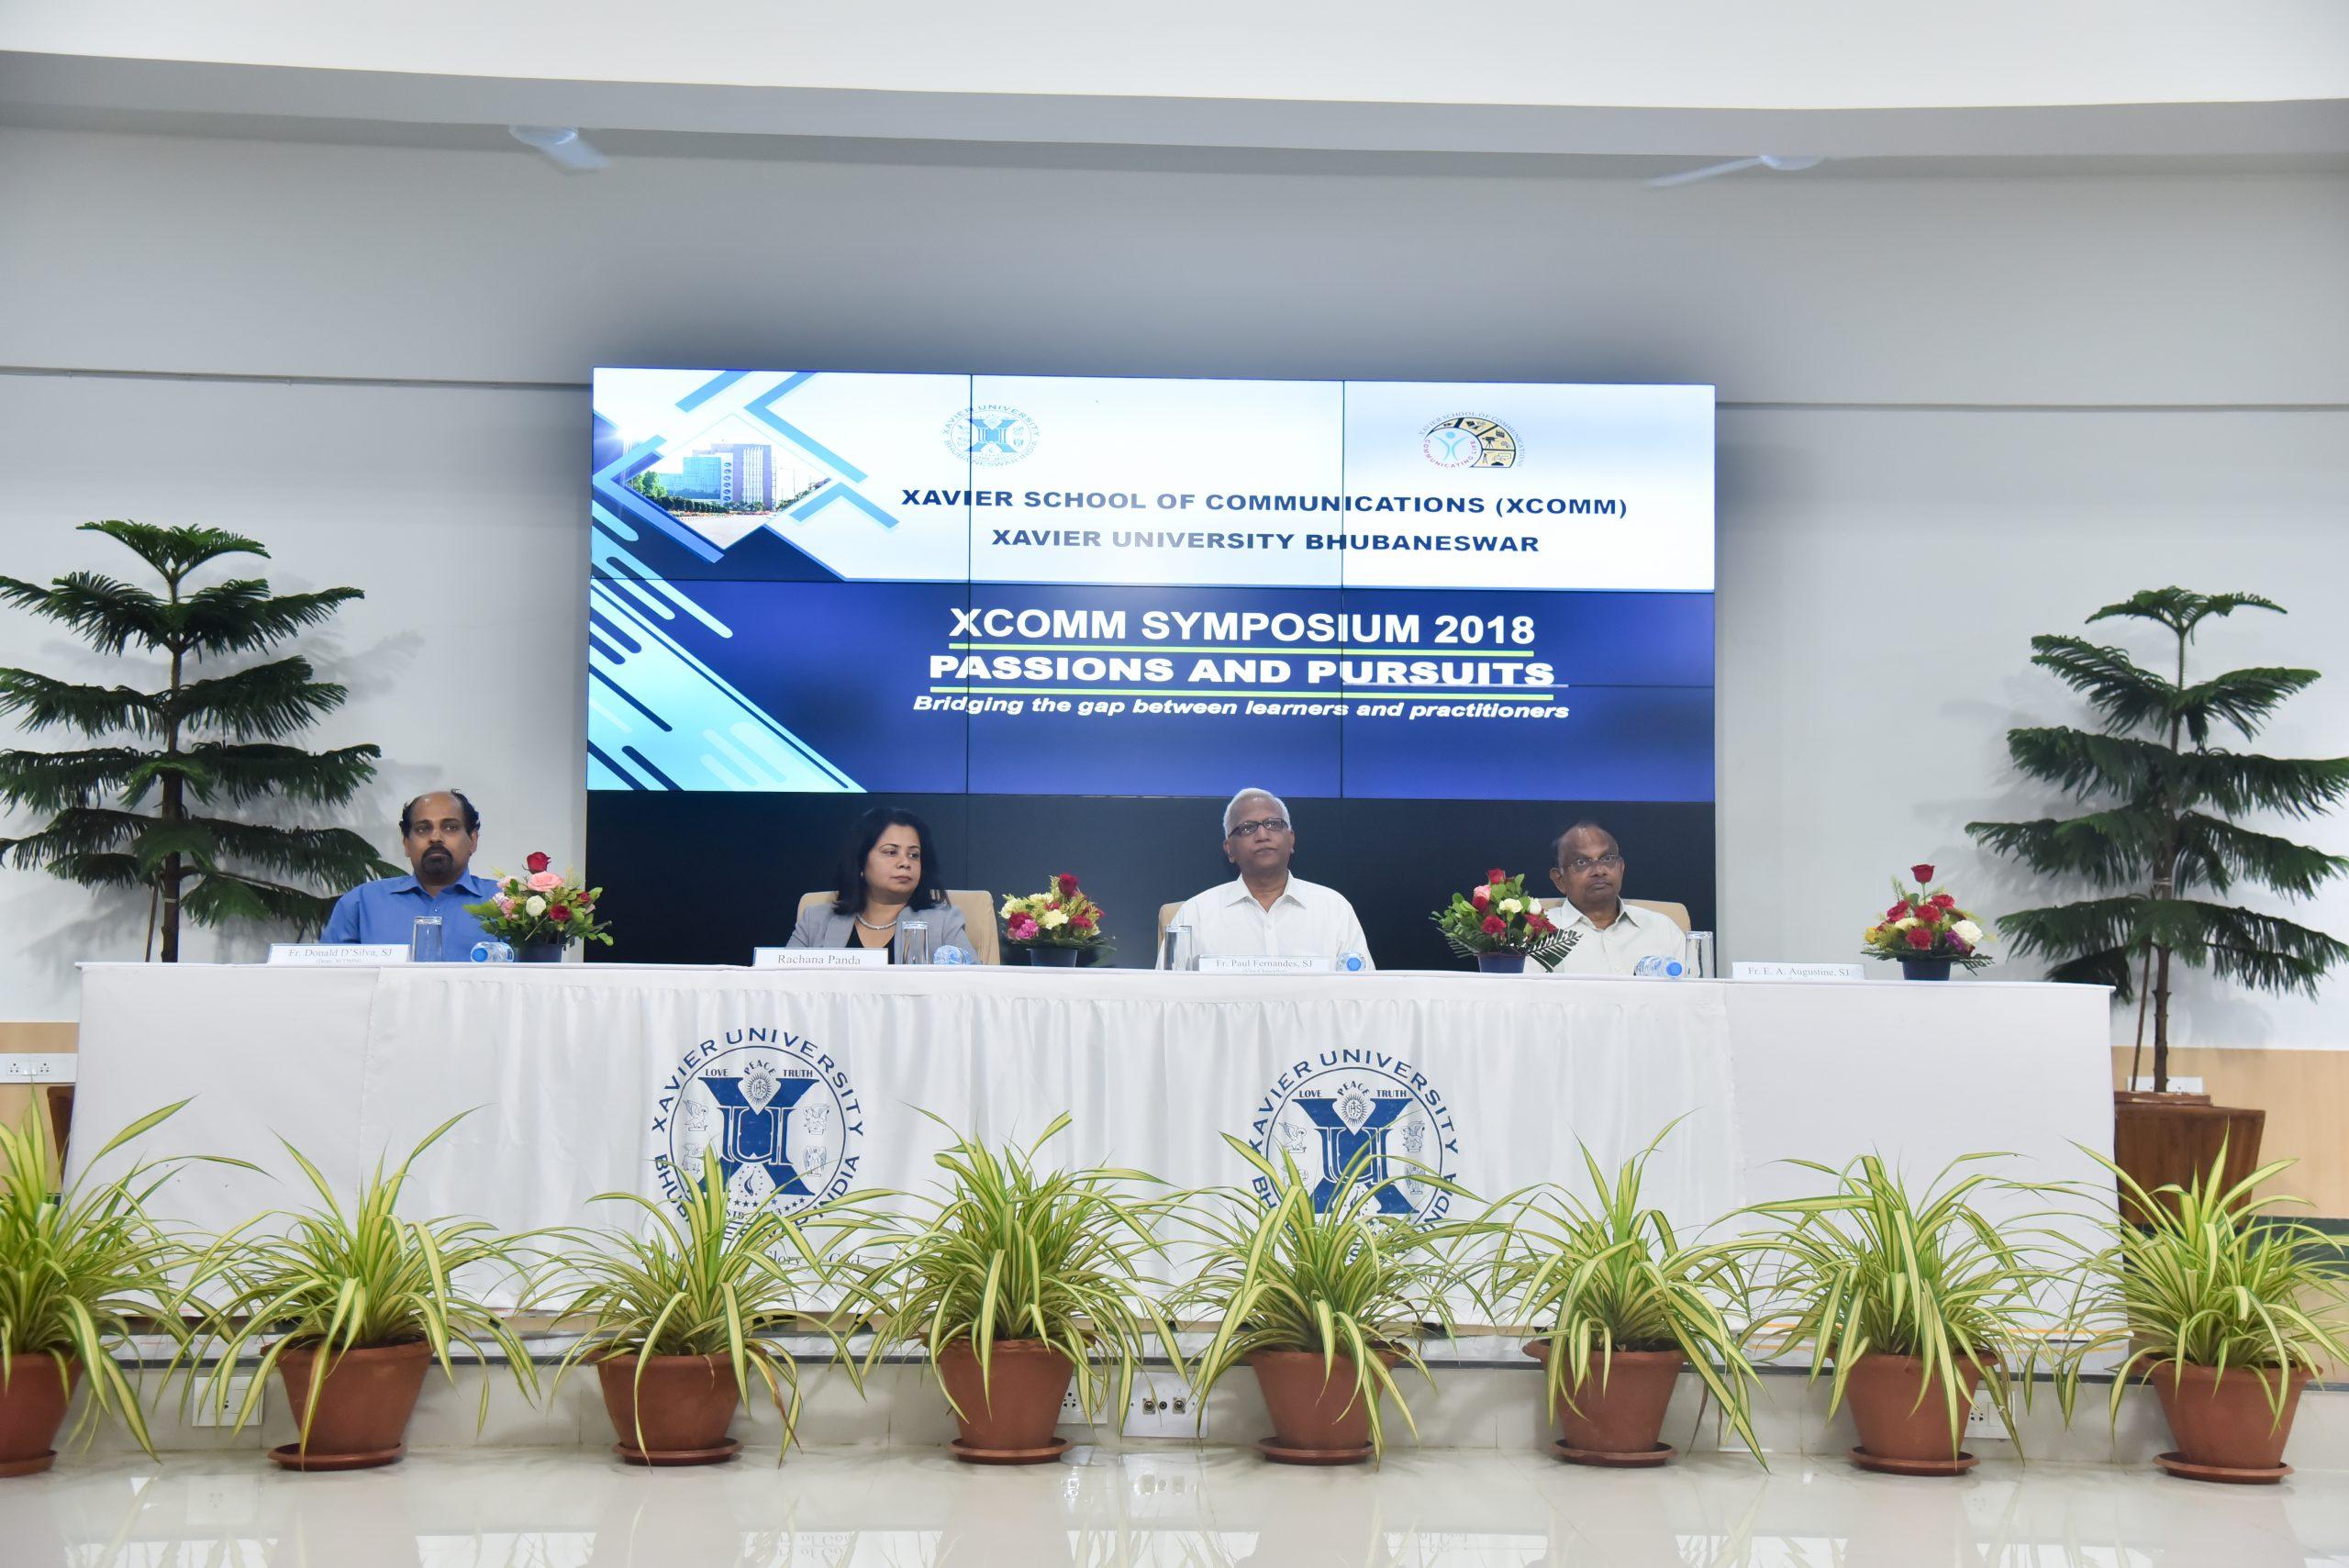 School of Communications Symposium 2018